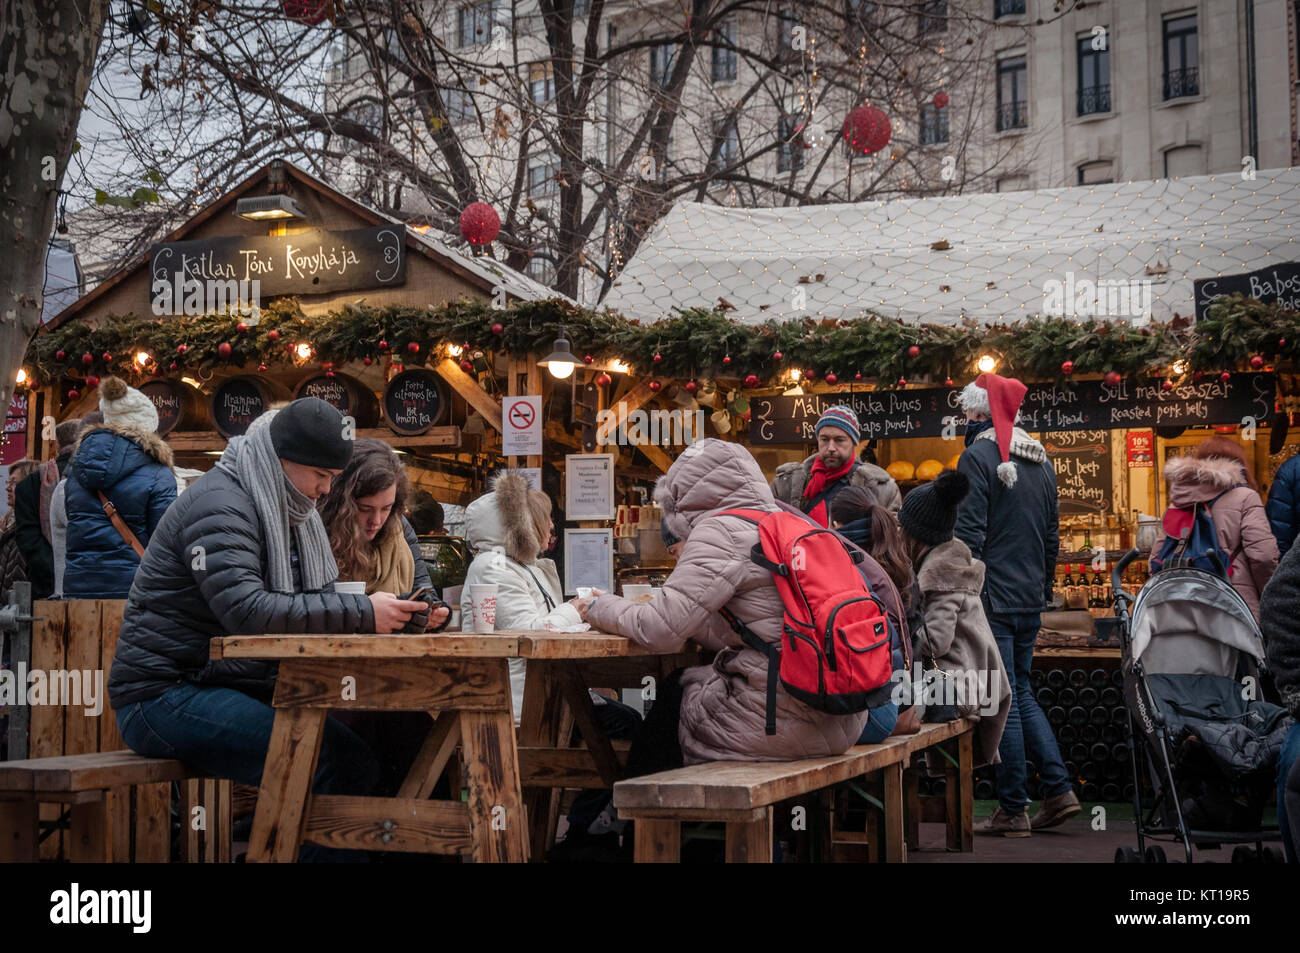 Christmas market in Budapest at Vörösmarty Square Stock Photo